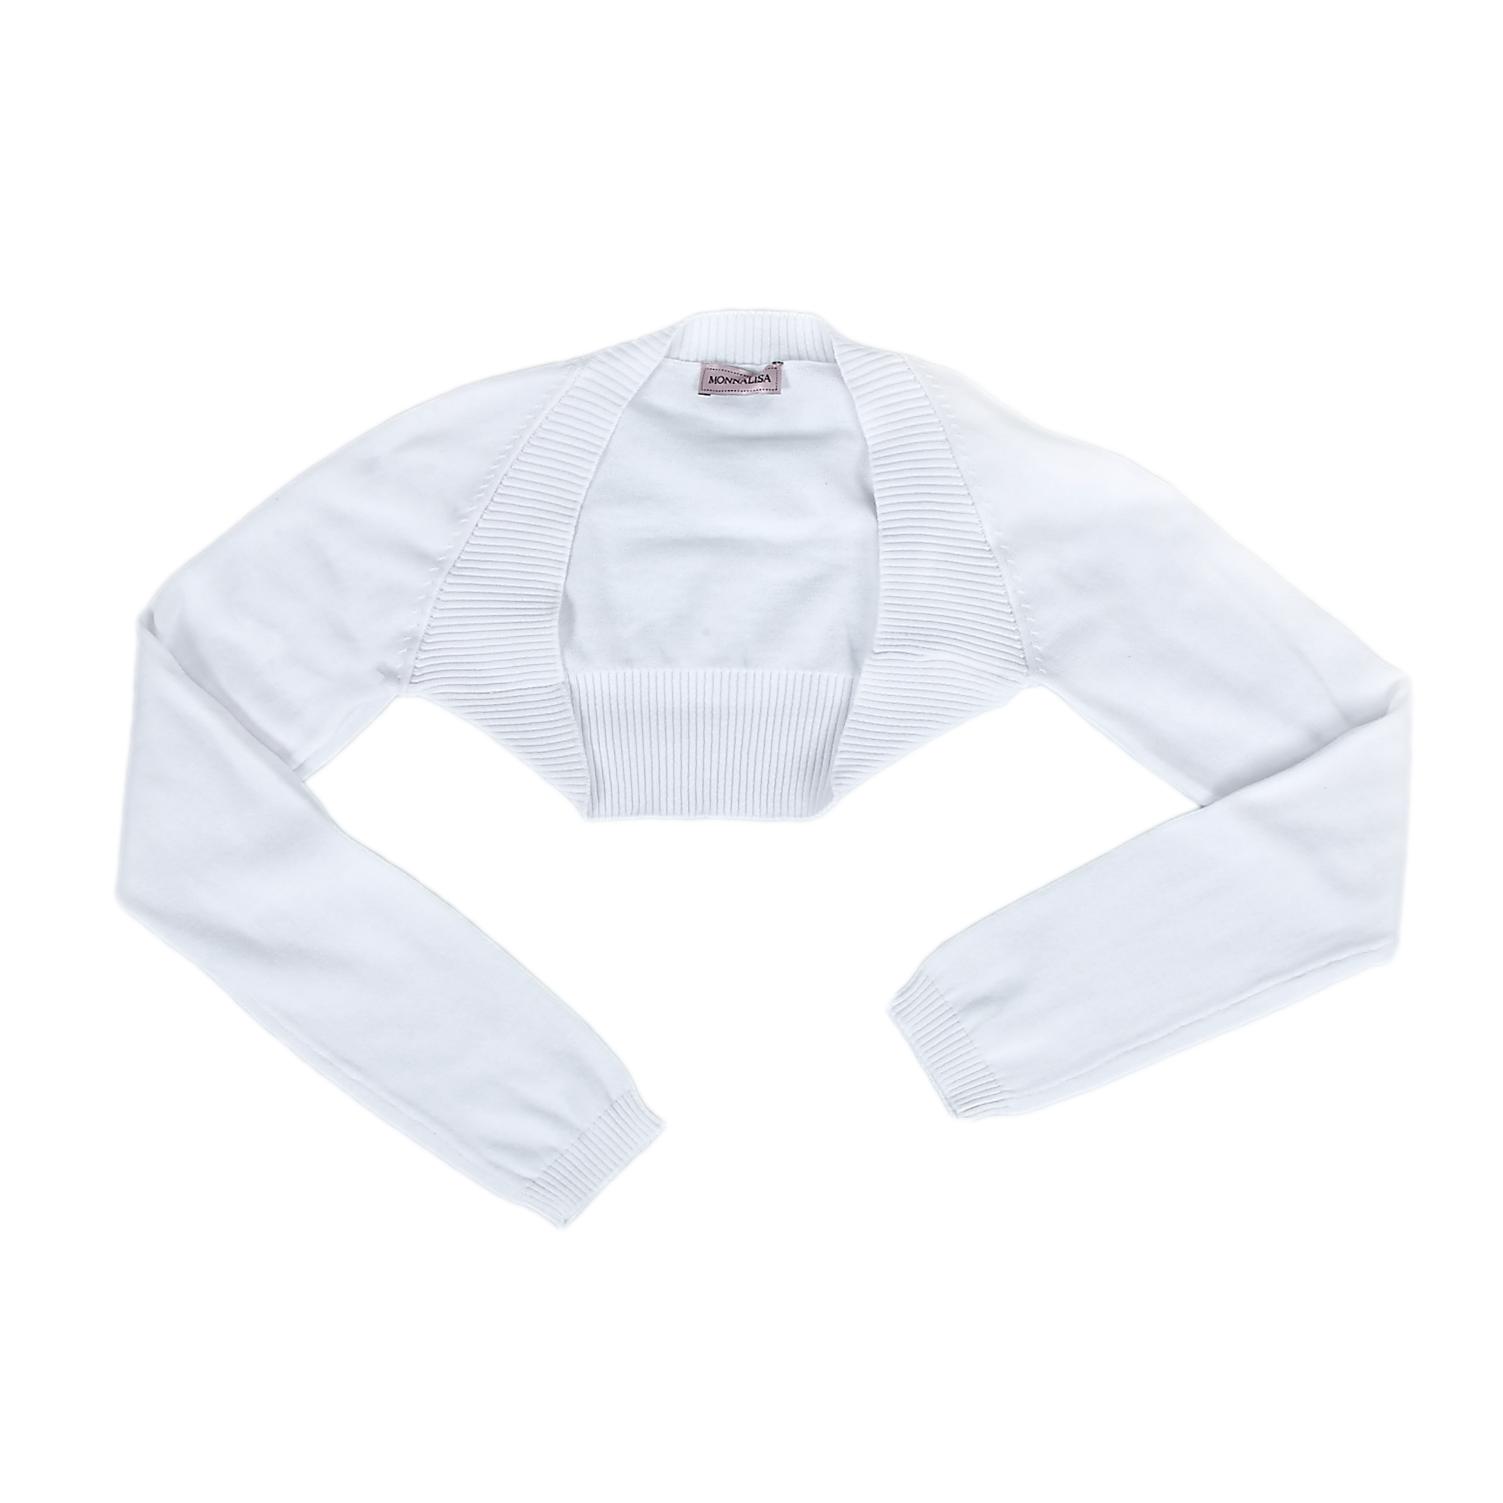 MONNALISA - Παιδικό μπολερό MONNALISA λευκό παιδικά girls ρούχα πλεκτά ζακέτες